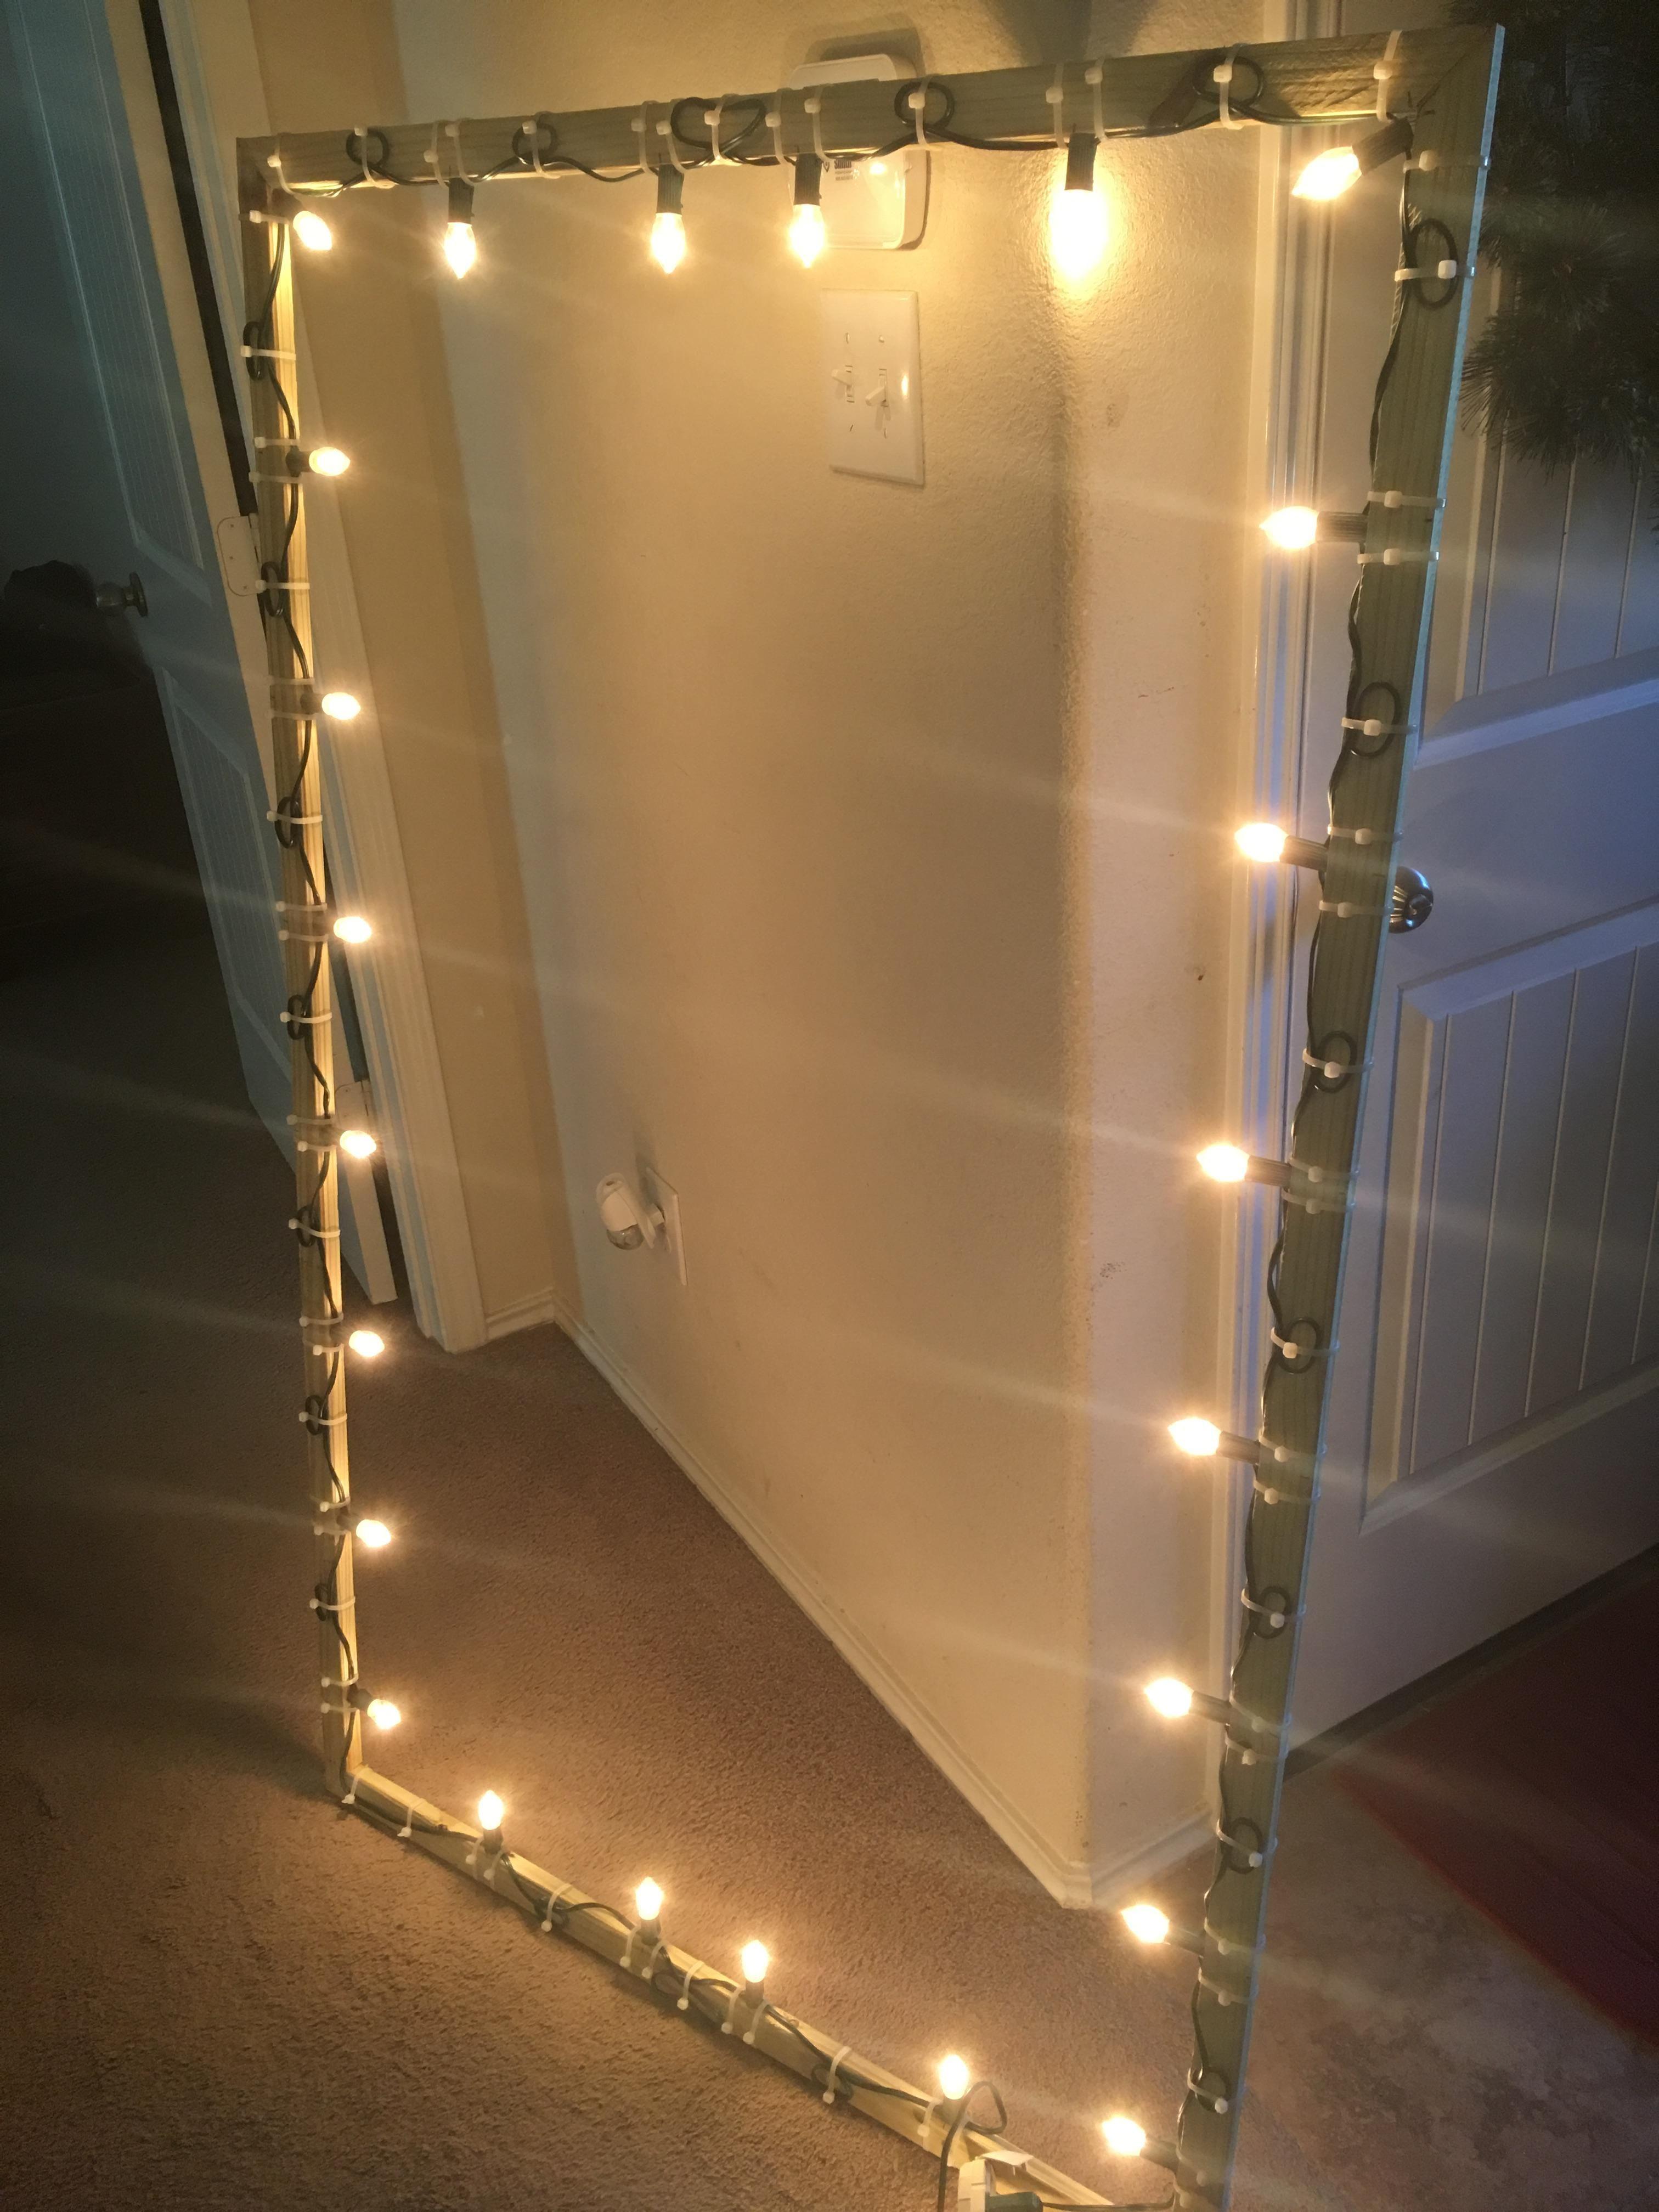 dorm christmas decorations